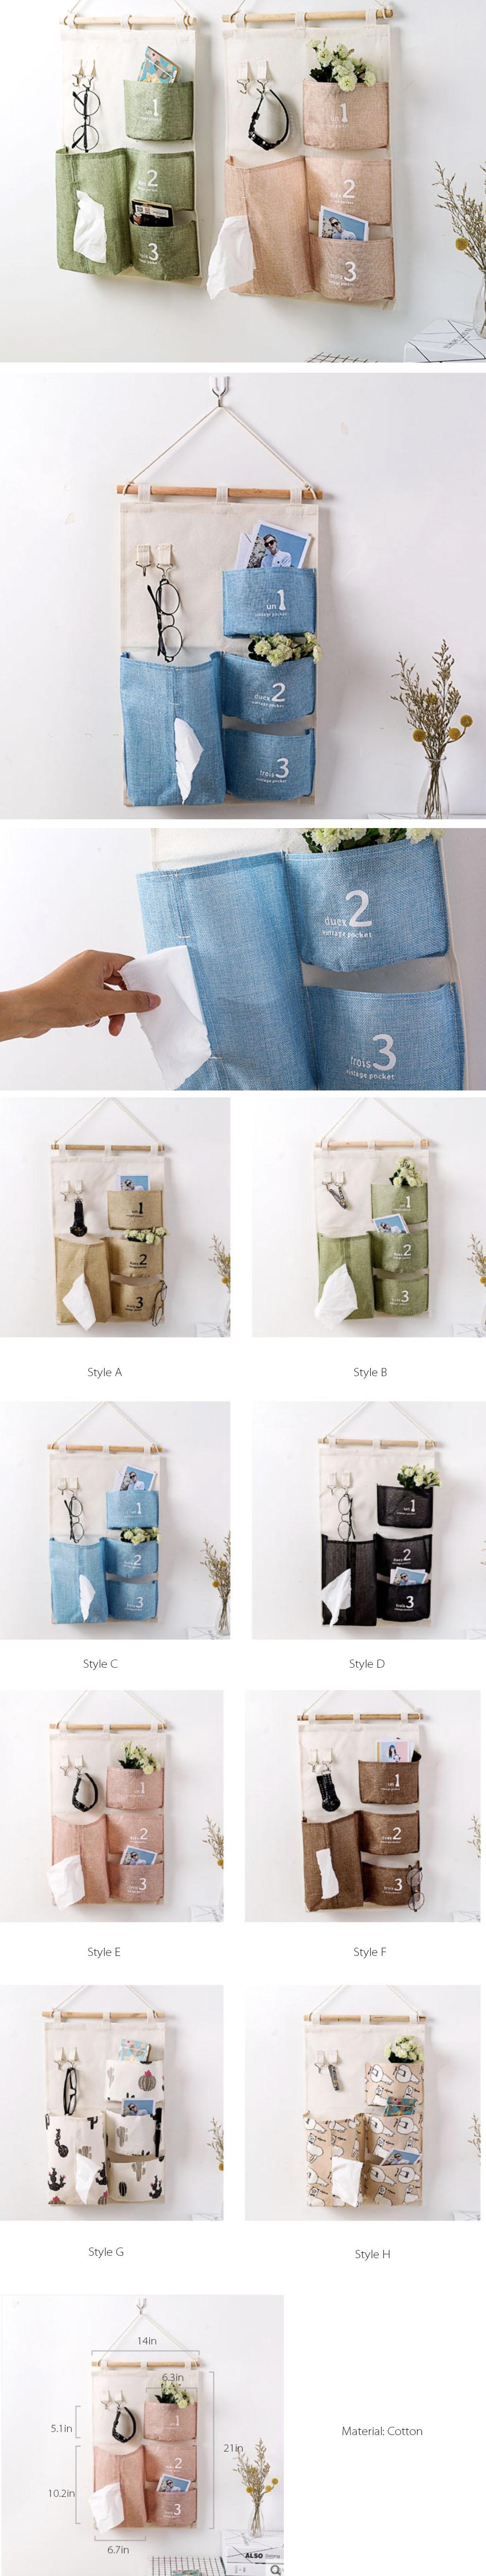 Hanging Storage Pockets Organize Your Accessories